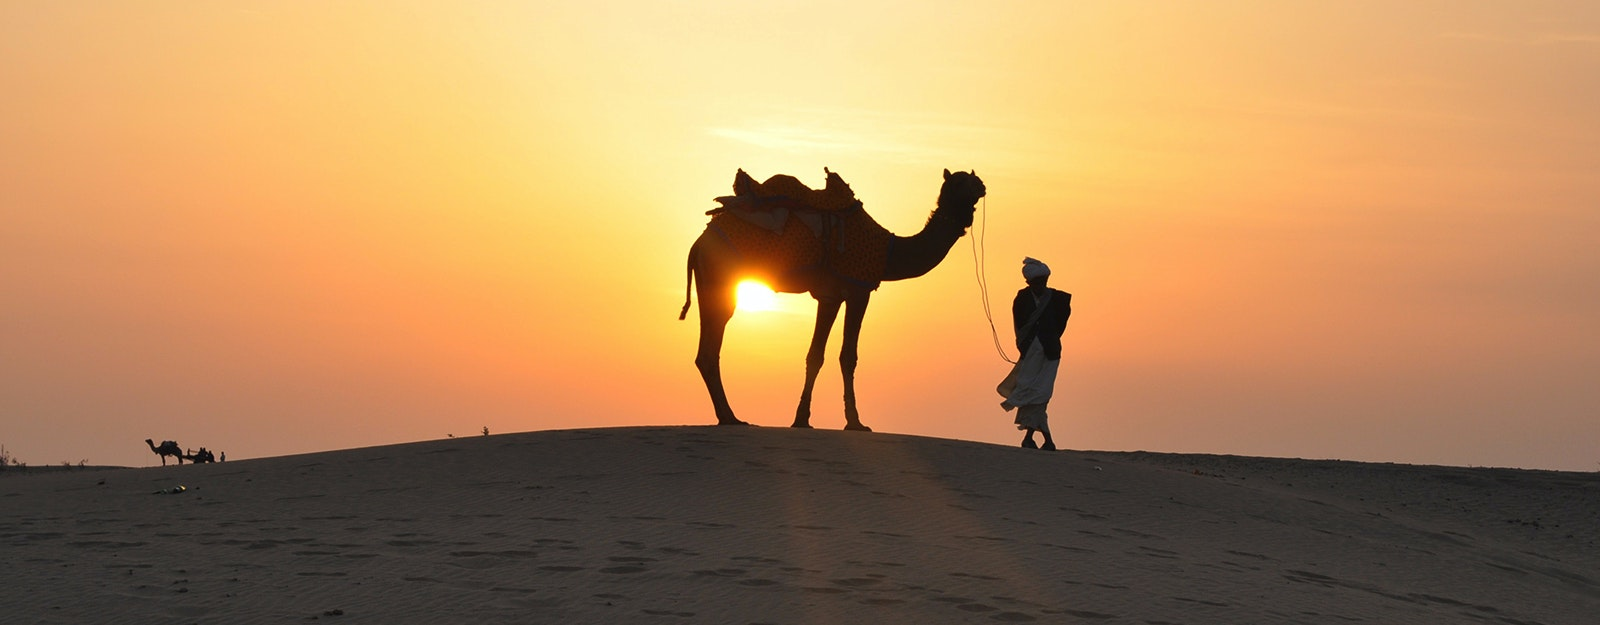 Camel rides and safaris dubai headout a typical camel desert safari experience thecheapjerseys Choice Image